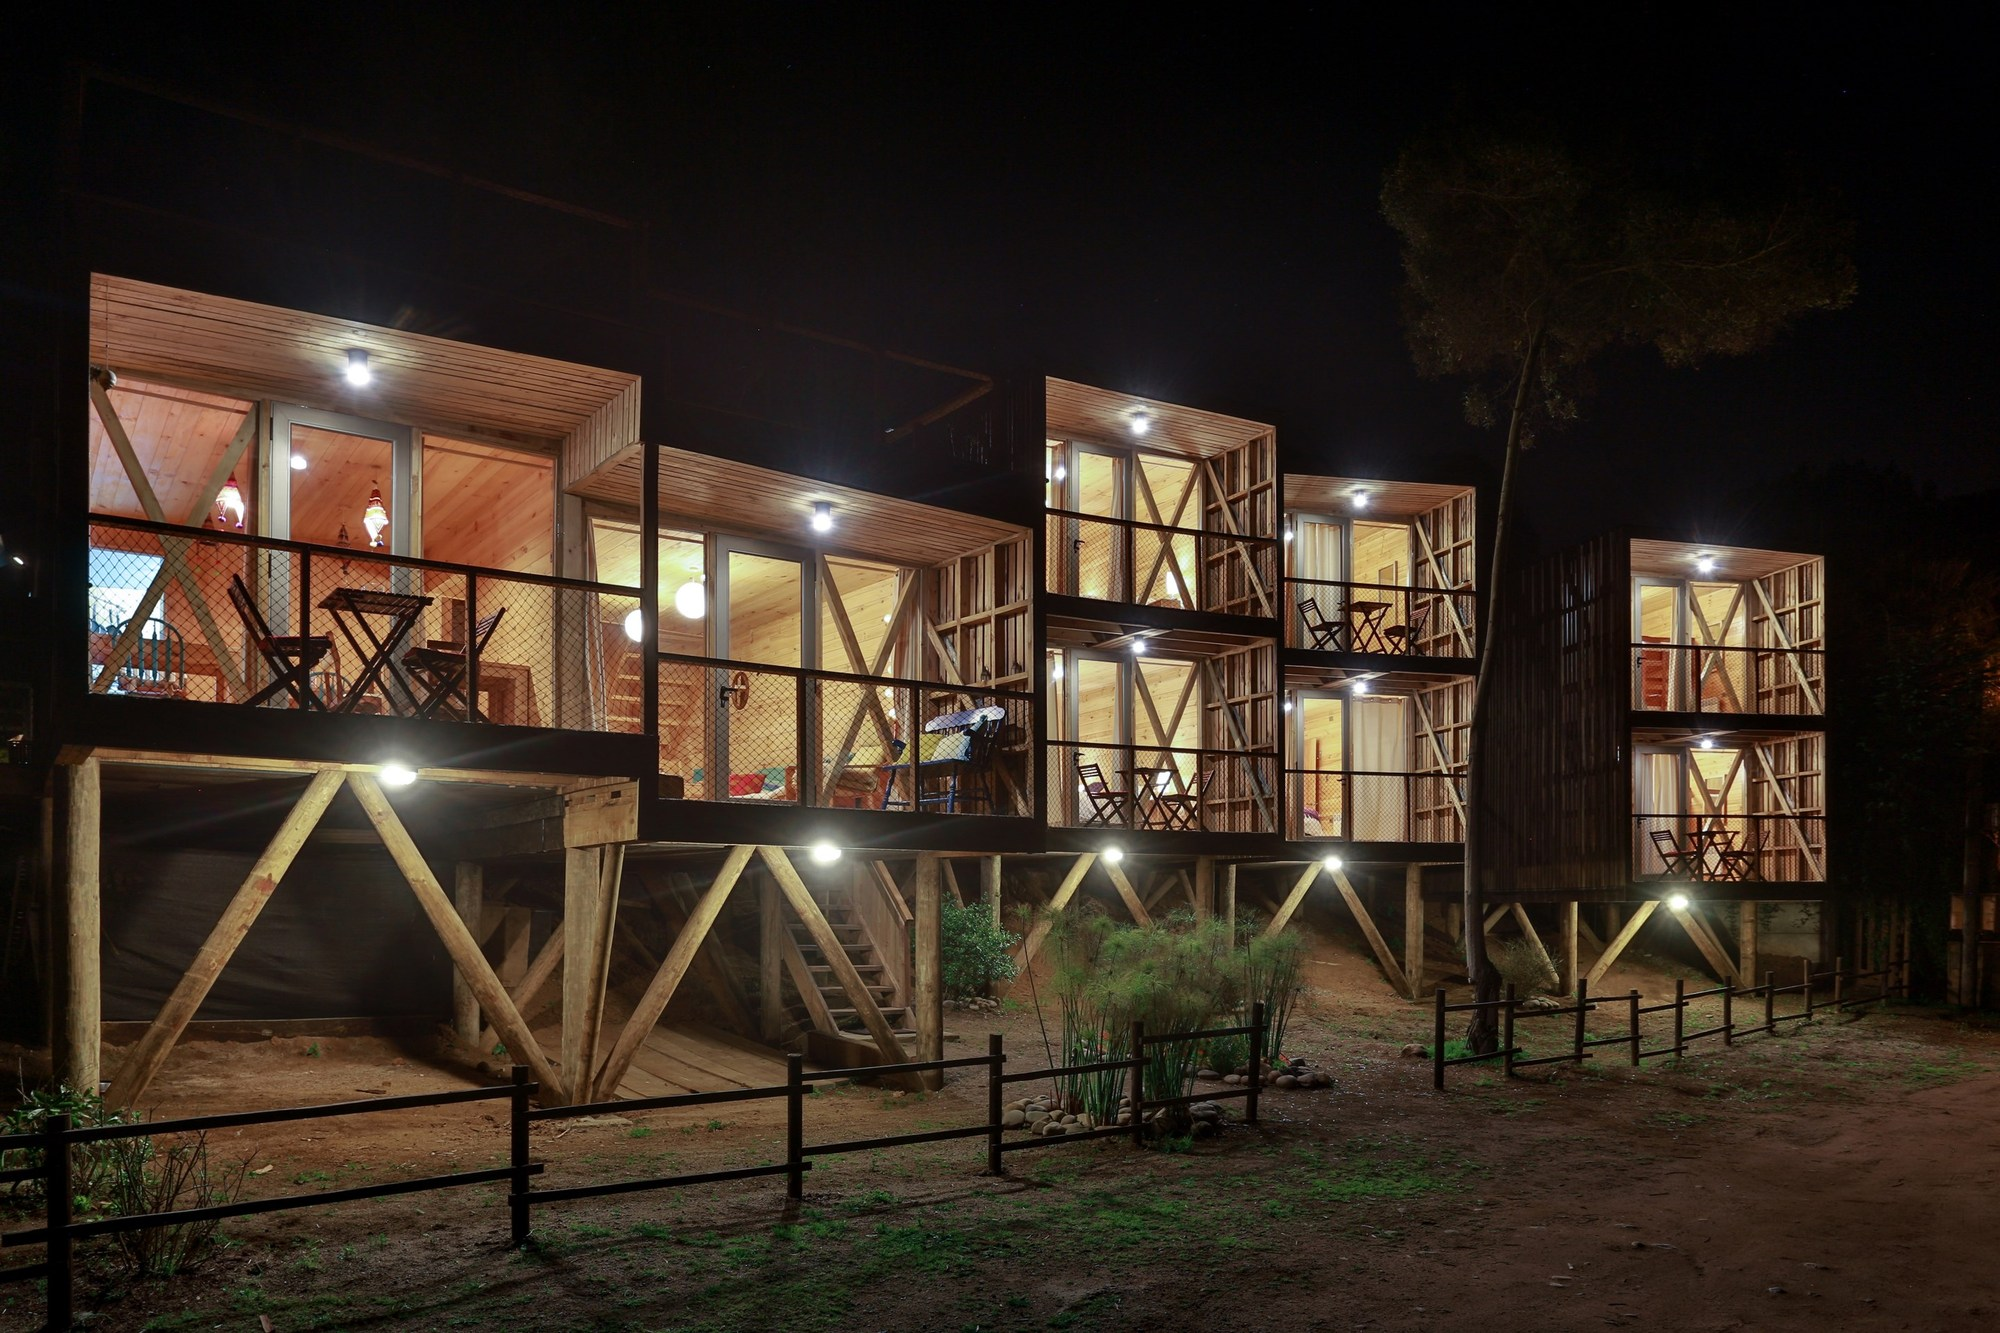 Hostal ritoque alejandro soffia gabriel rudolphy for Arquitectura minimalista casas